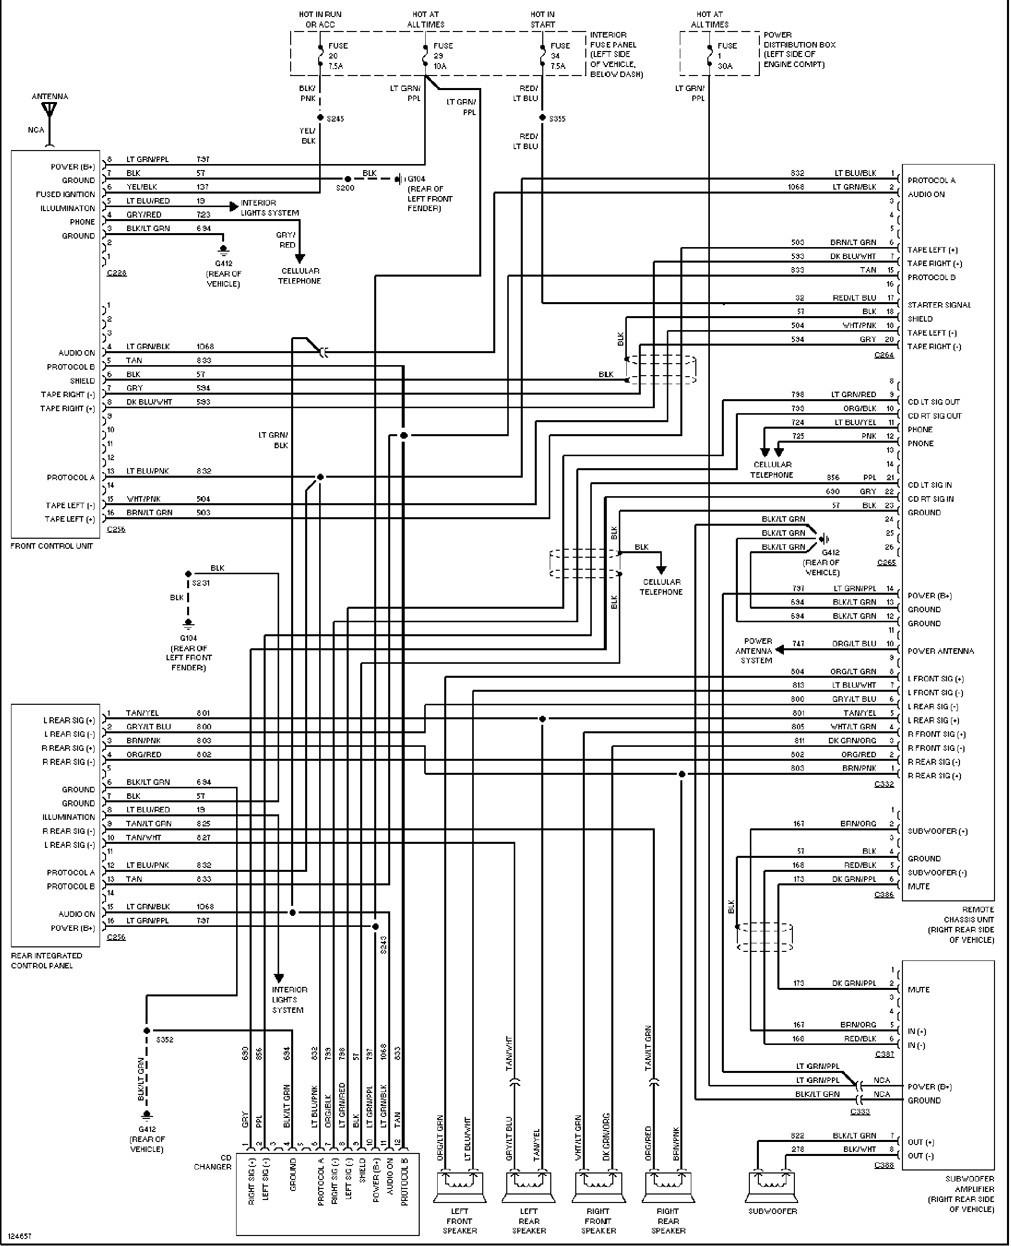 1998 Ford F150 Pickup Truck Car Radio Wiring Diagram 1998 Ford F150 - 1998 Ford F150 Radio Wiring Diagram